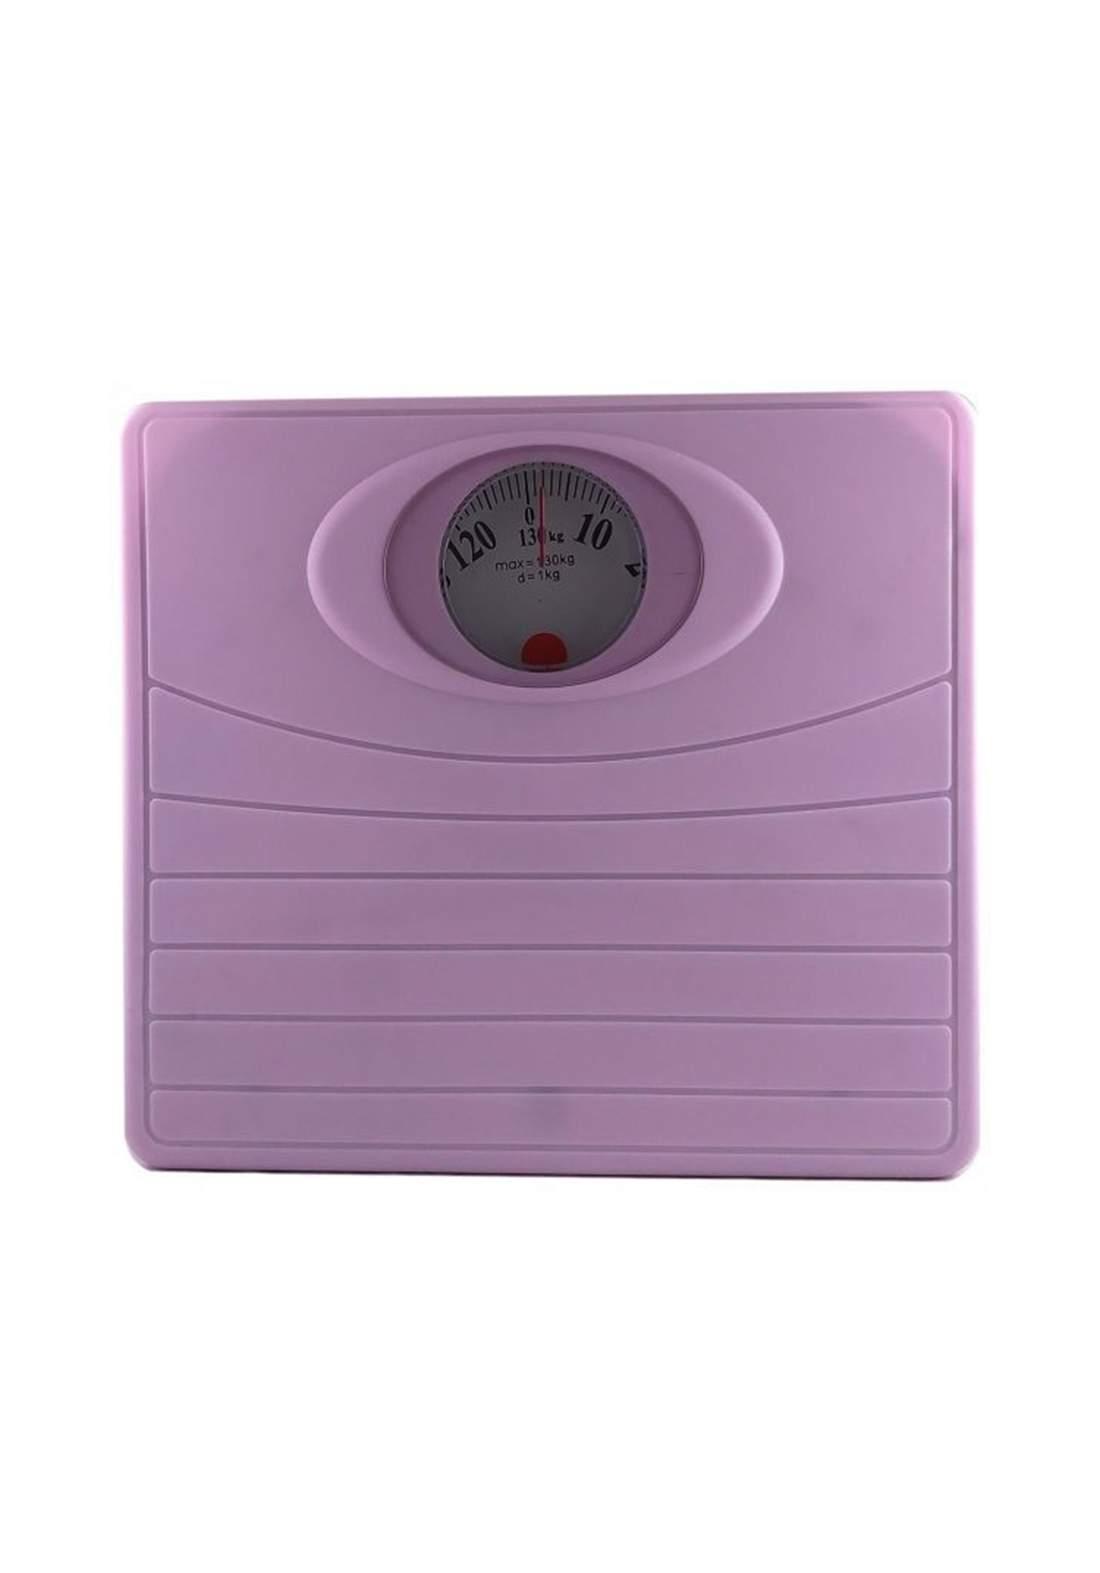 Cecial Index Scale - 130 kg  ميزان ميكانيكي